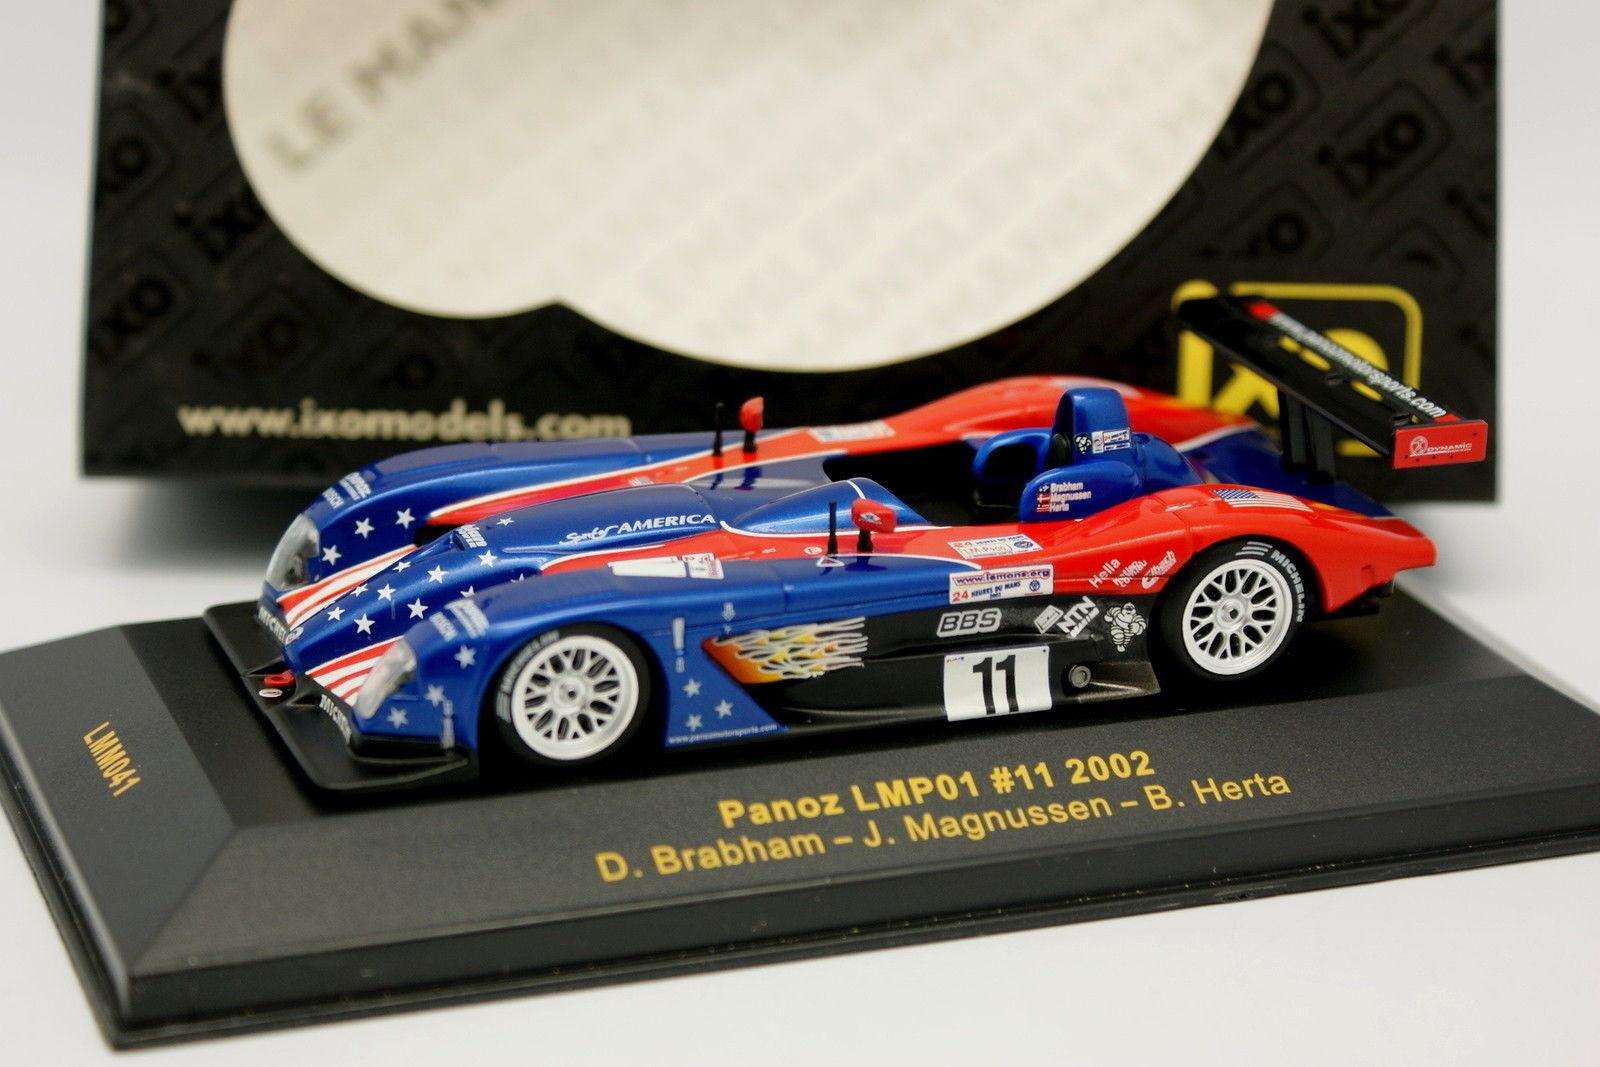 Ixo 1 43 - Panoz LMP01 N°11 Le Mans 2002